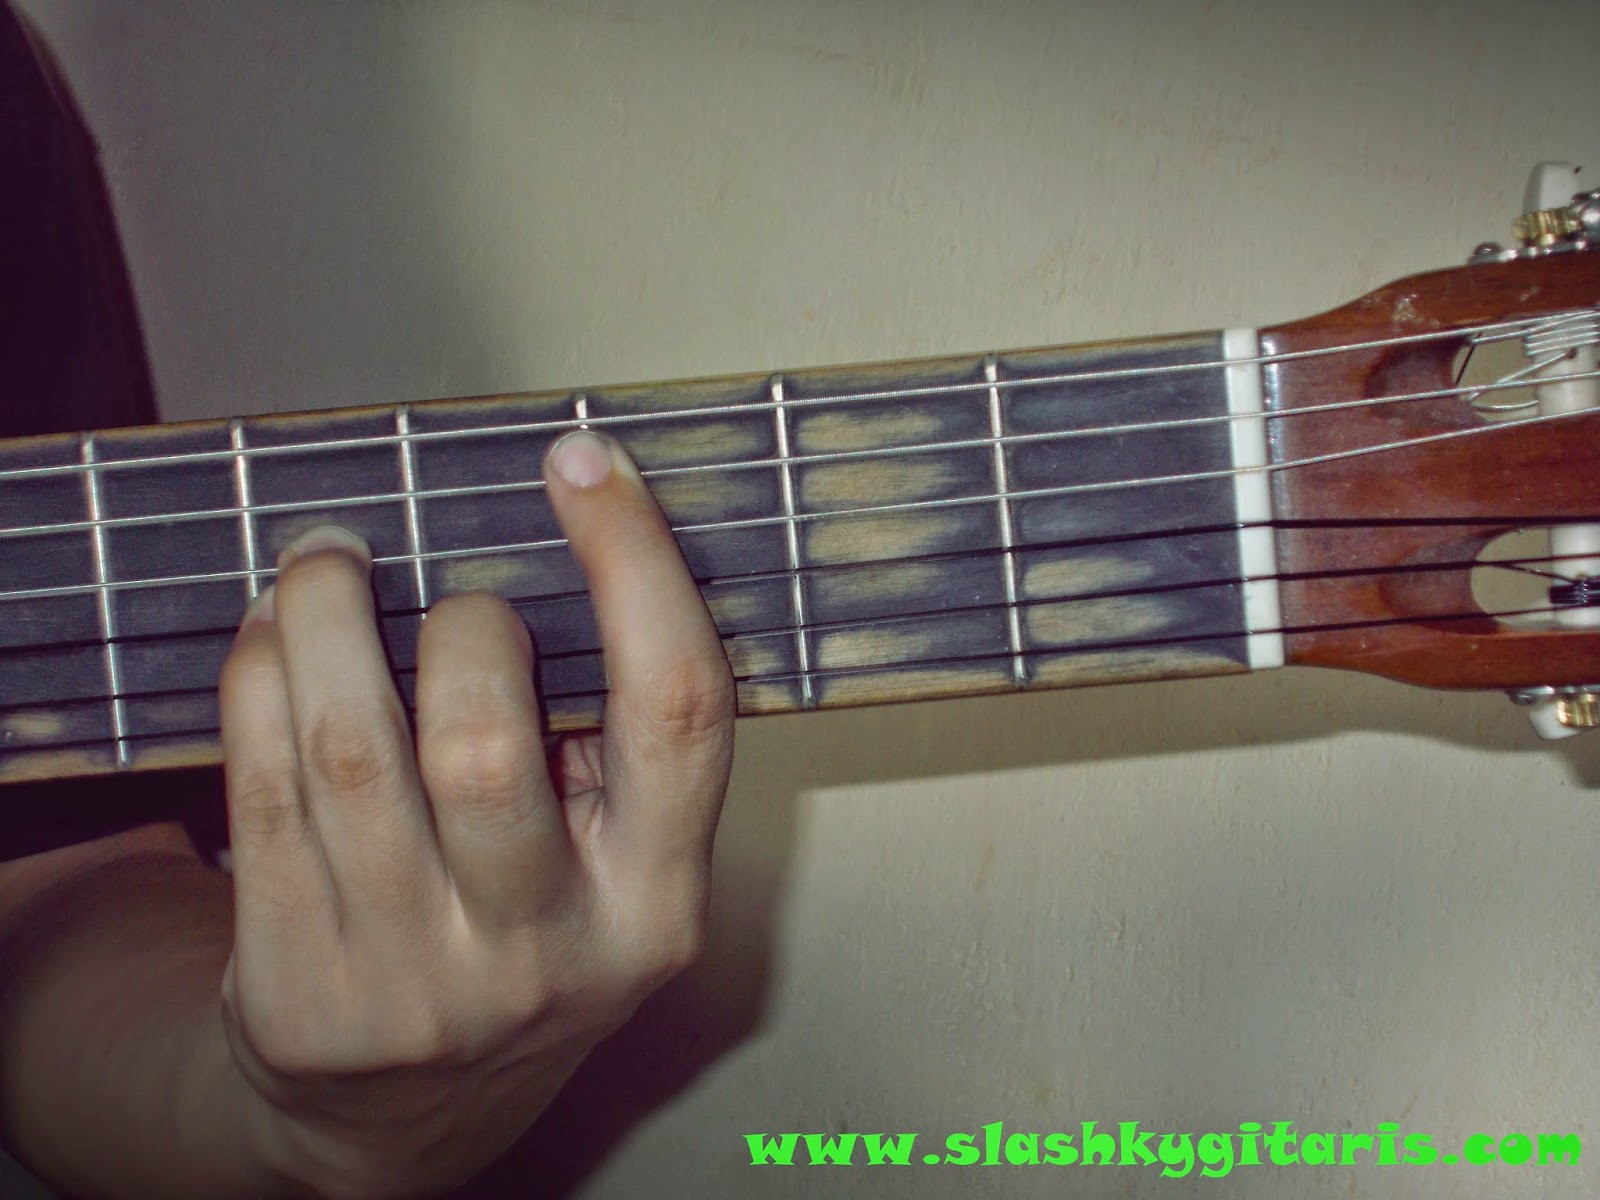 belajar chord gitar, belajar gitar, belajar gitar pemula, belajar kunci gitar, kunci gitar, video guitar,